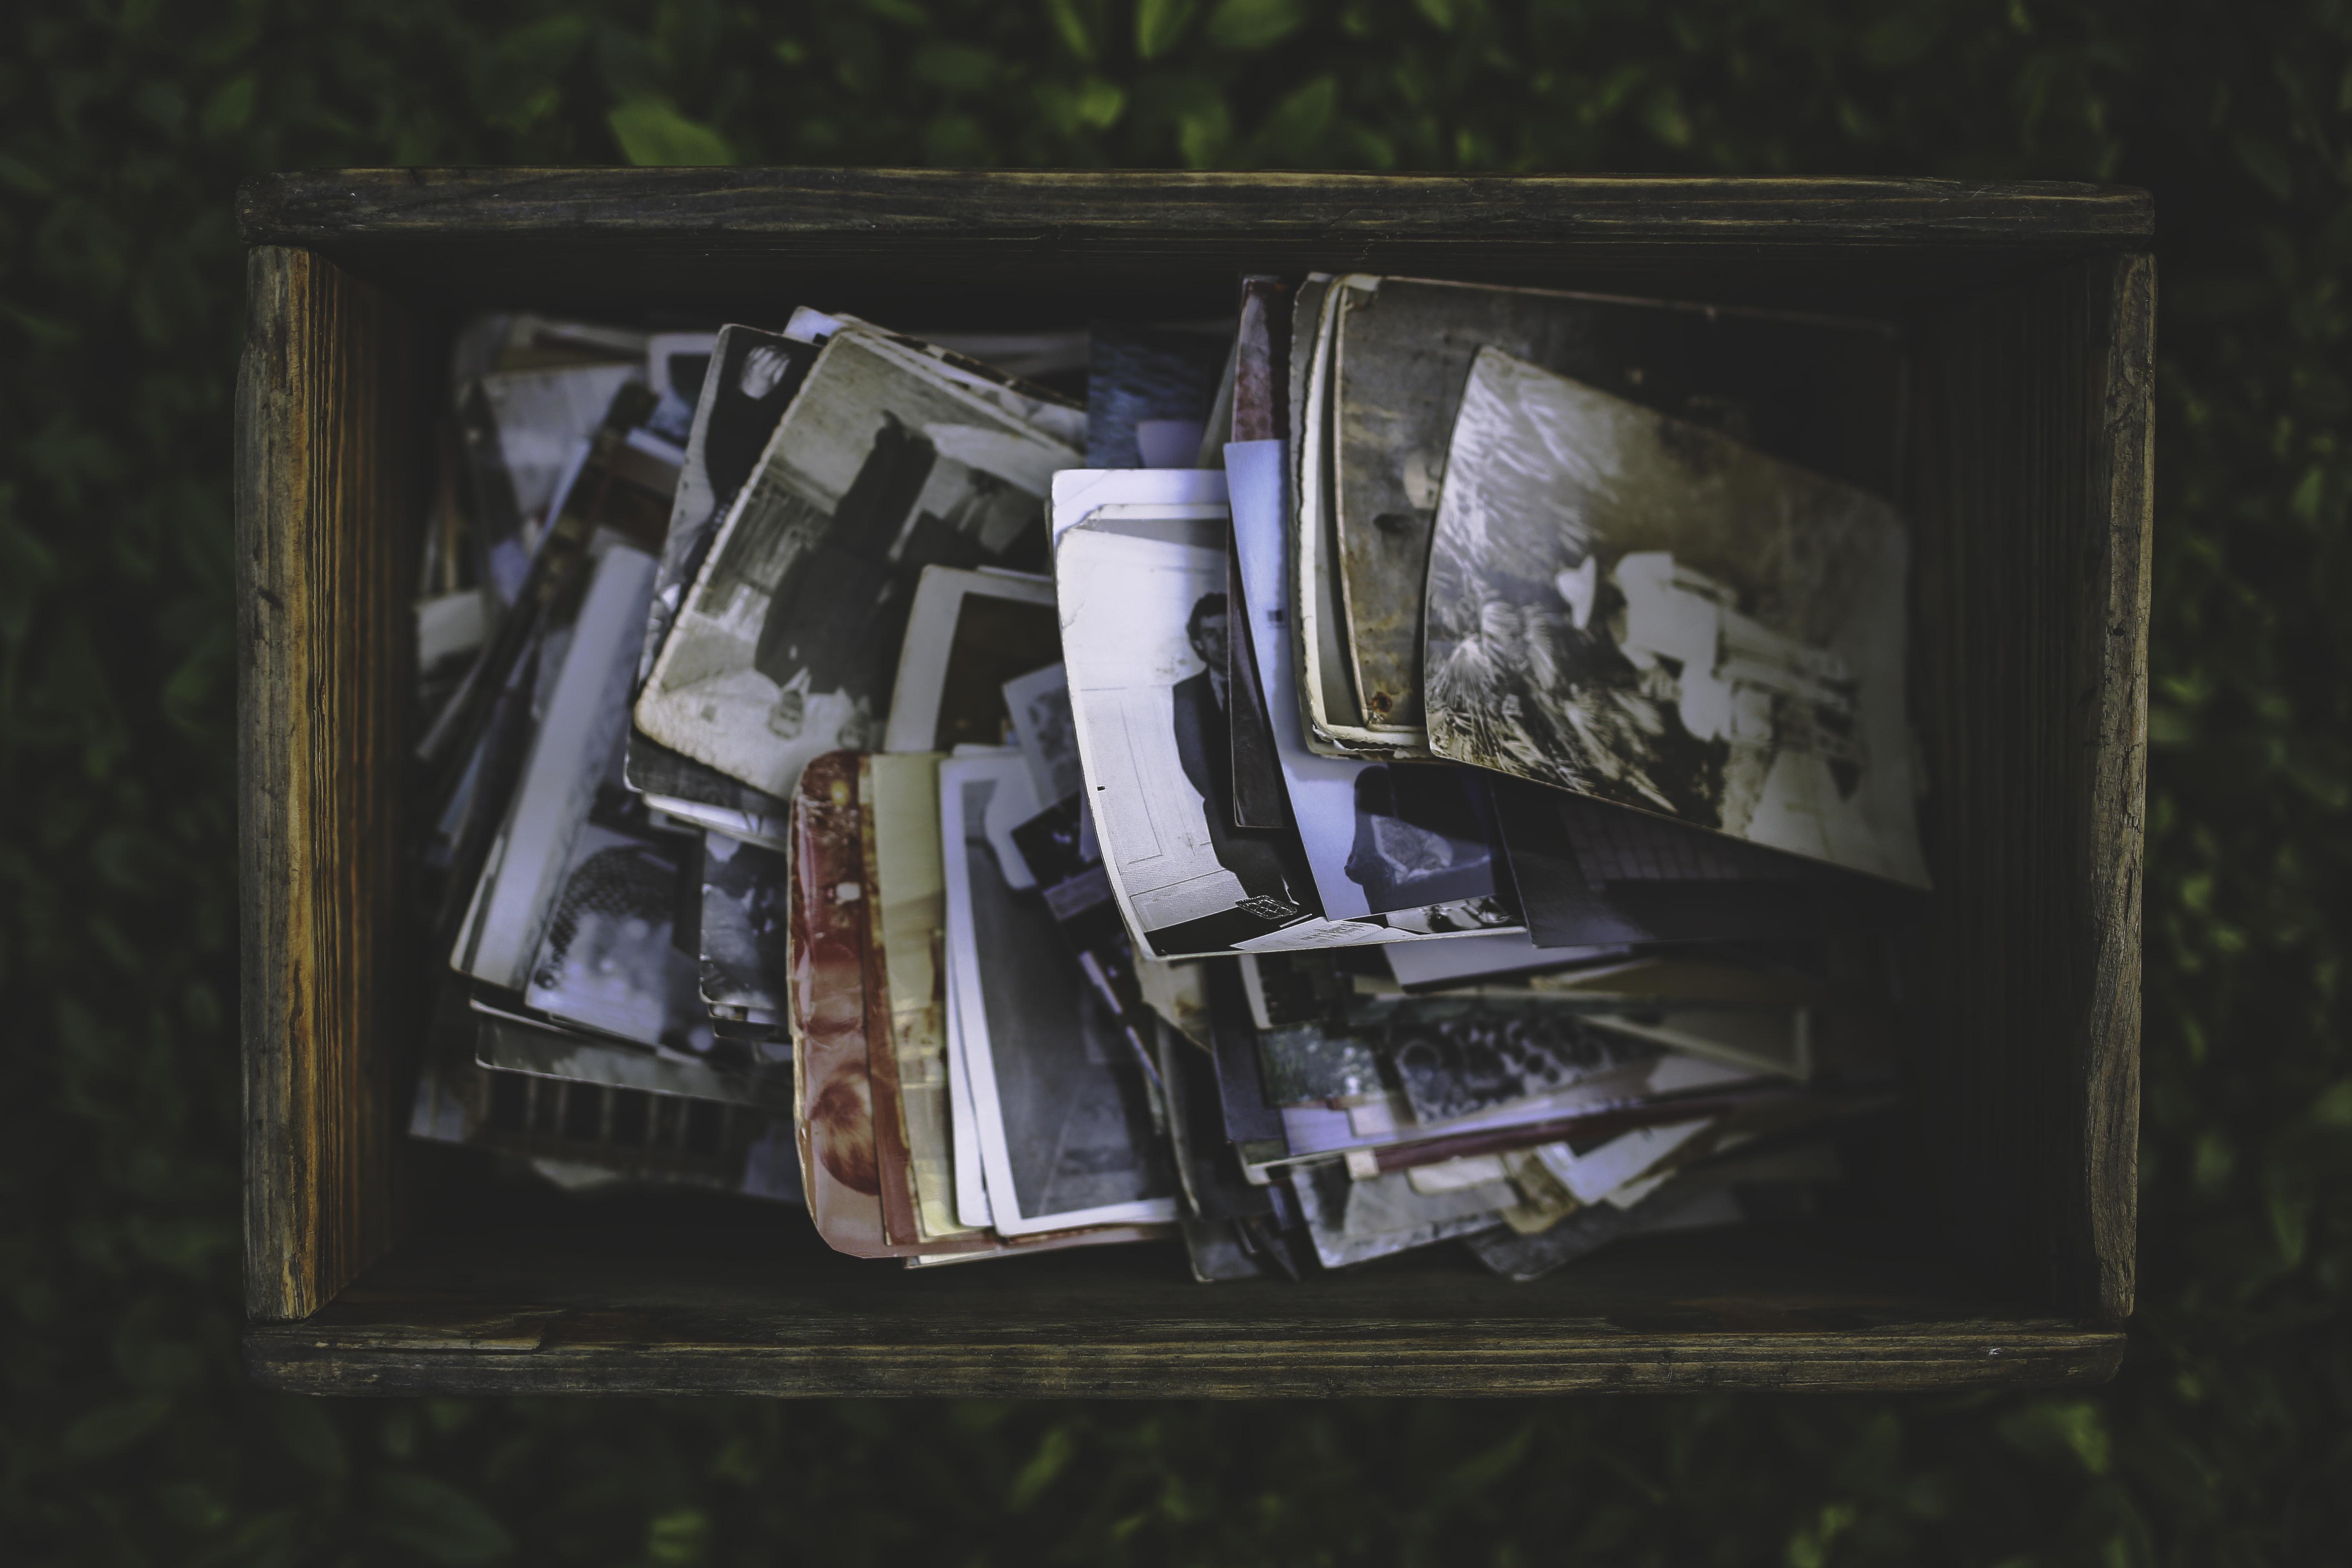 Print Permanence and Longevity